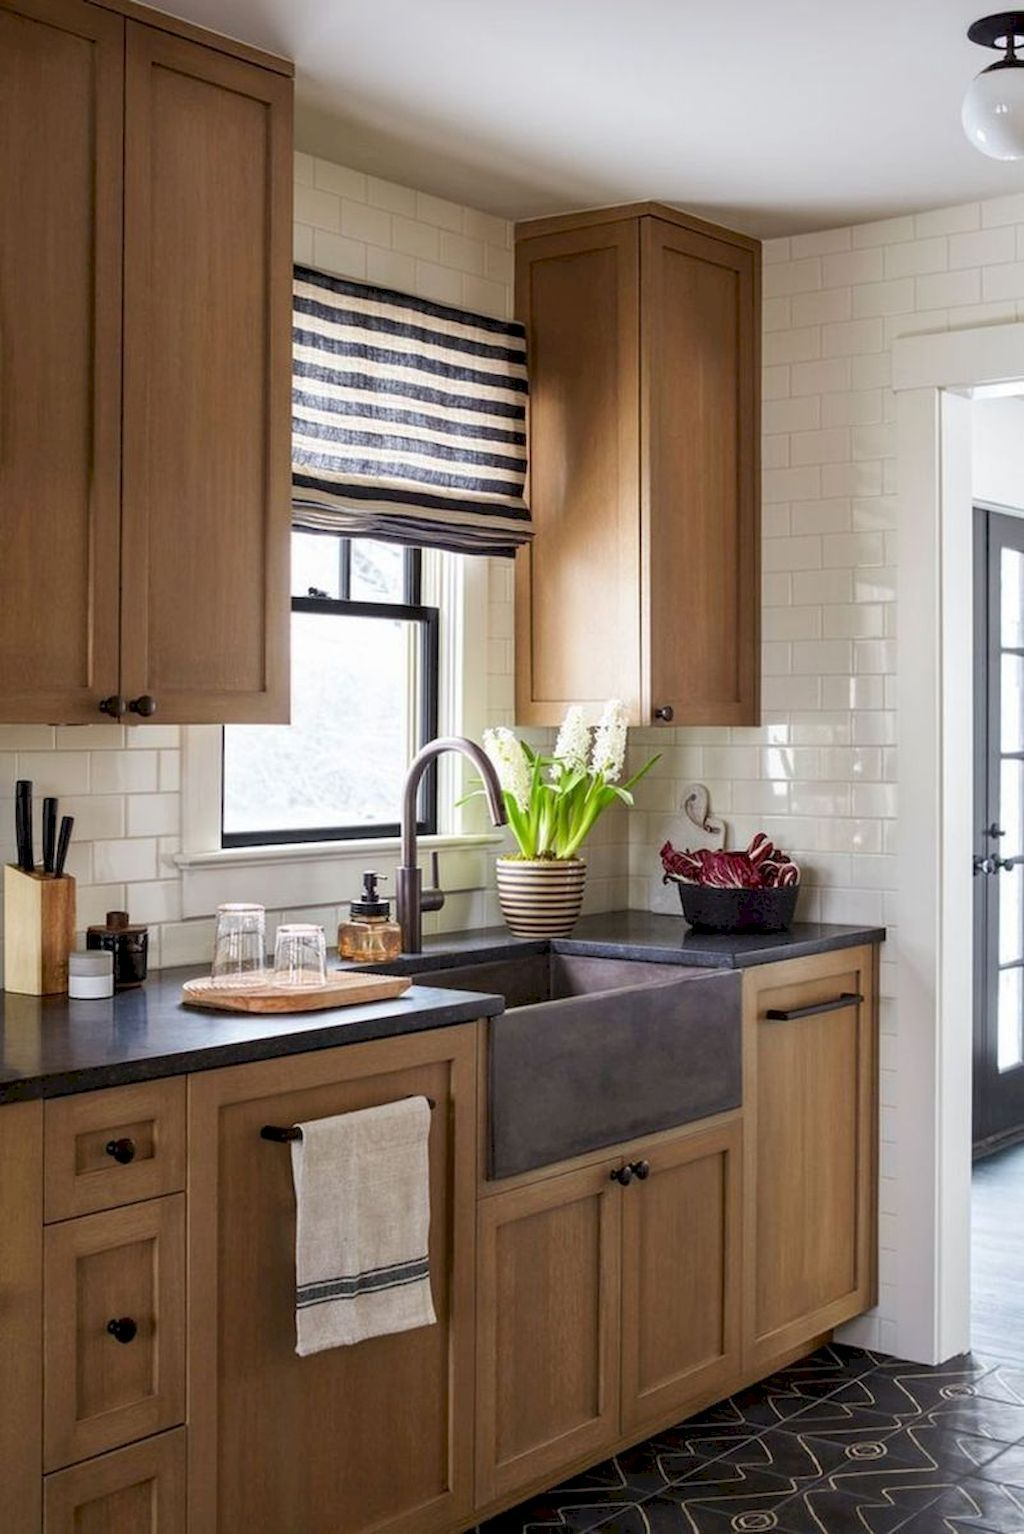 57 Modern Farmhouse Kitchen Cabinet Makeover Design Ideas In 2019